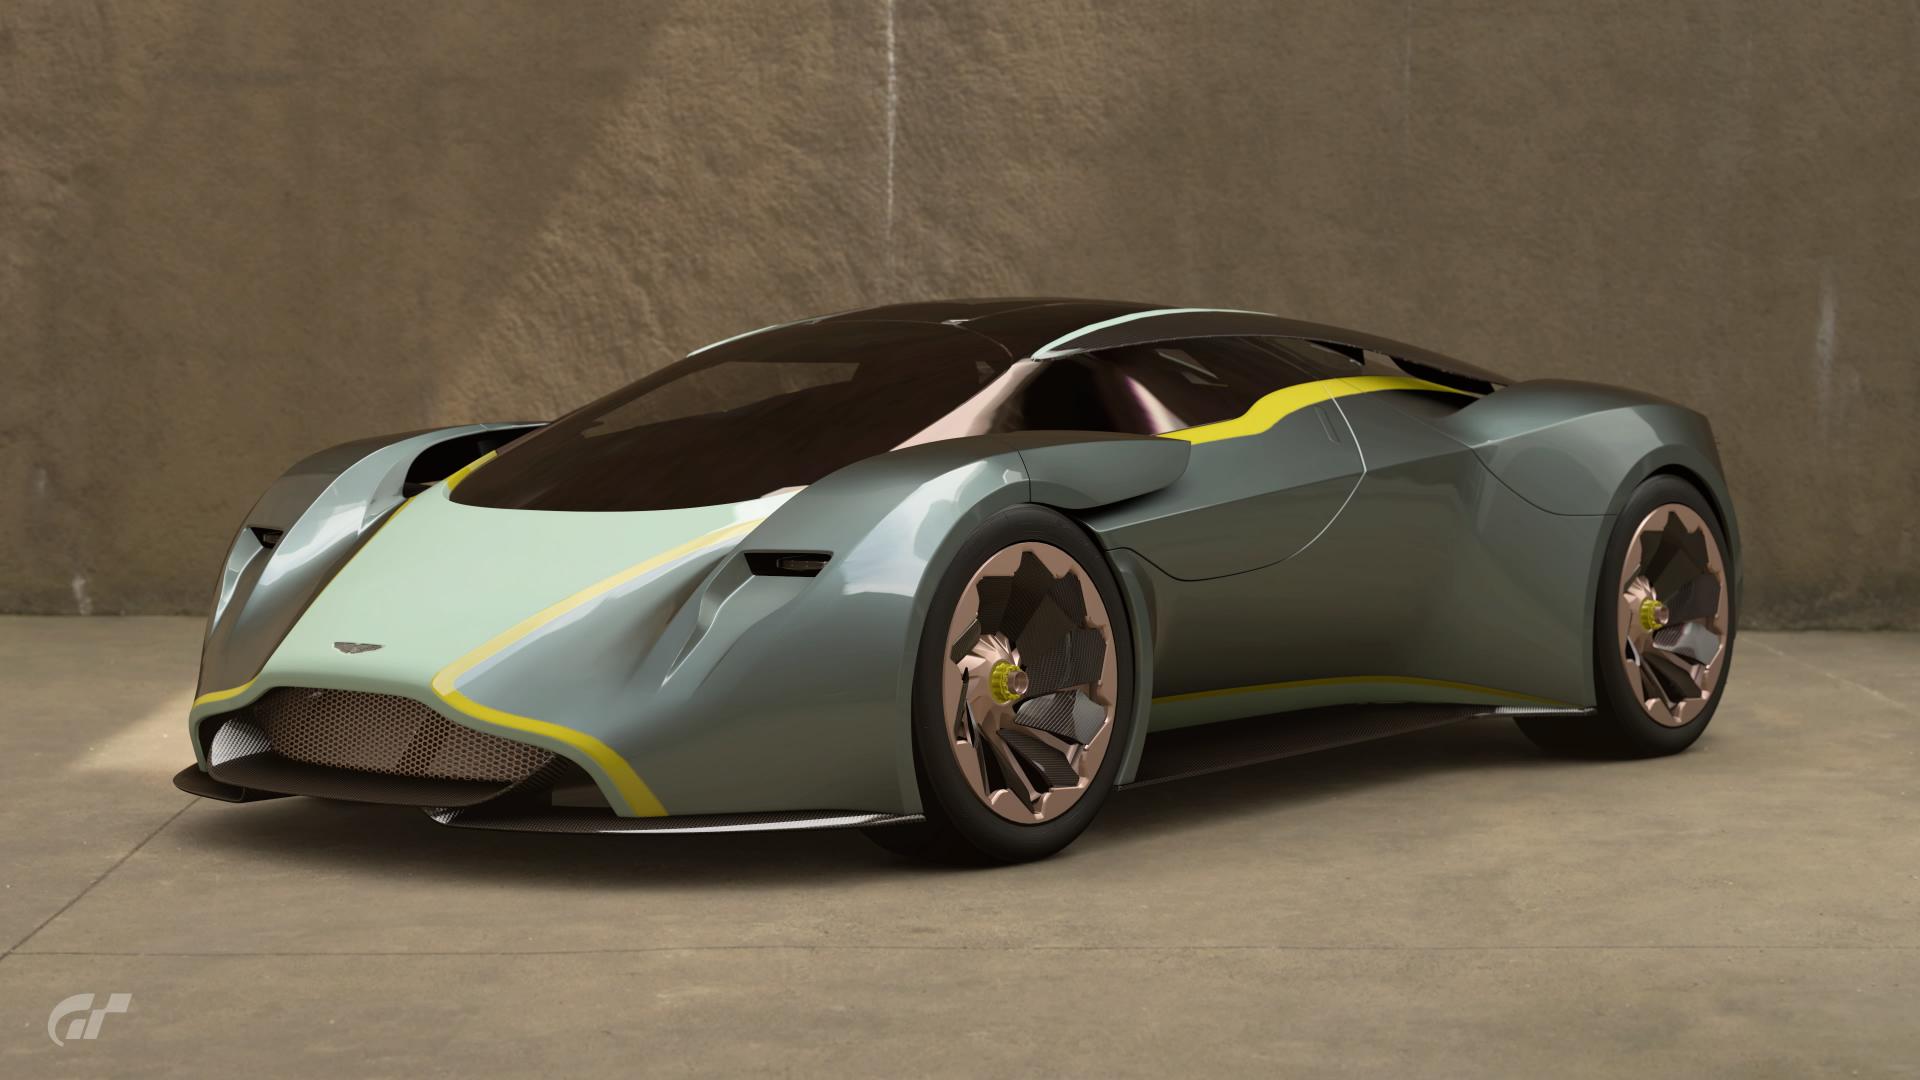 Aston Martin DP Vision Gran Turismo Gran Turismo Wiki FANDOM - Aston martin wiki